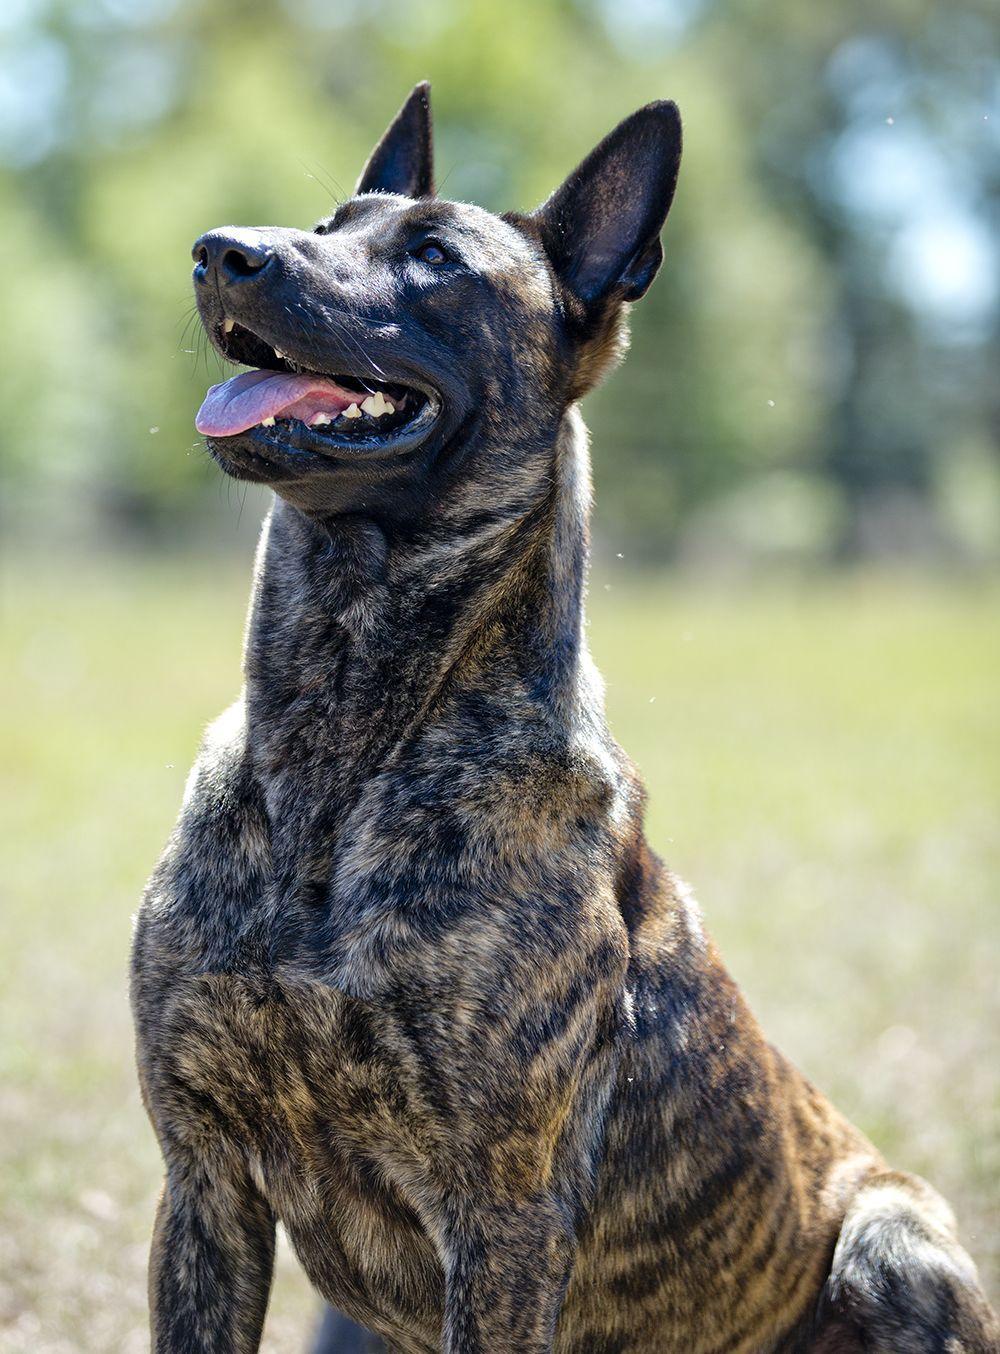 Pin by Kait on Dogs   Malinois puppies, Dutch shepherd dog ...